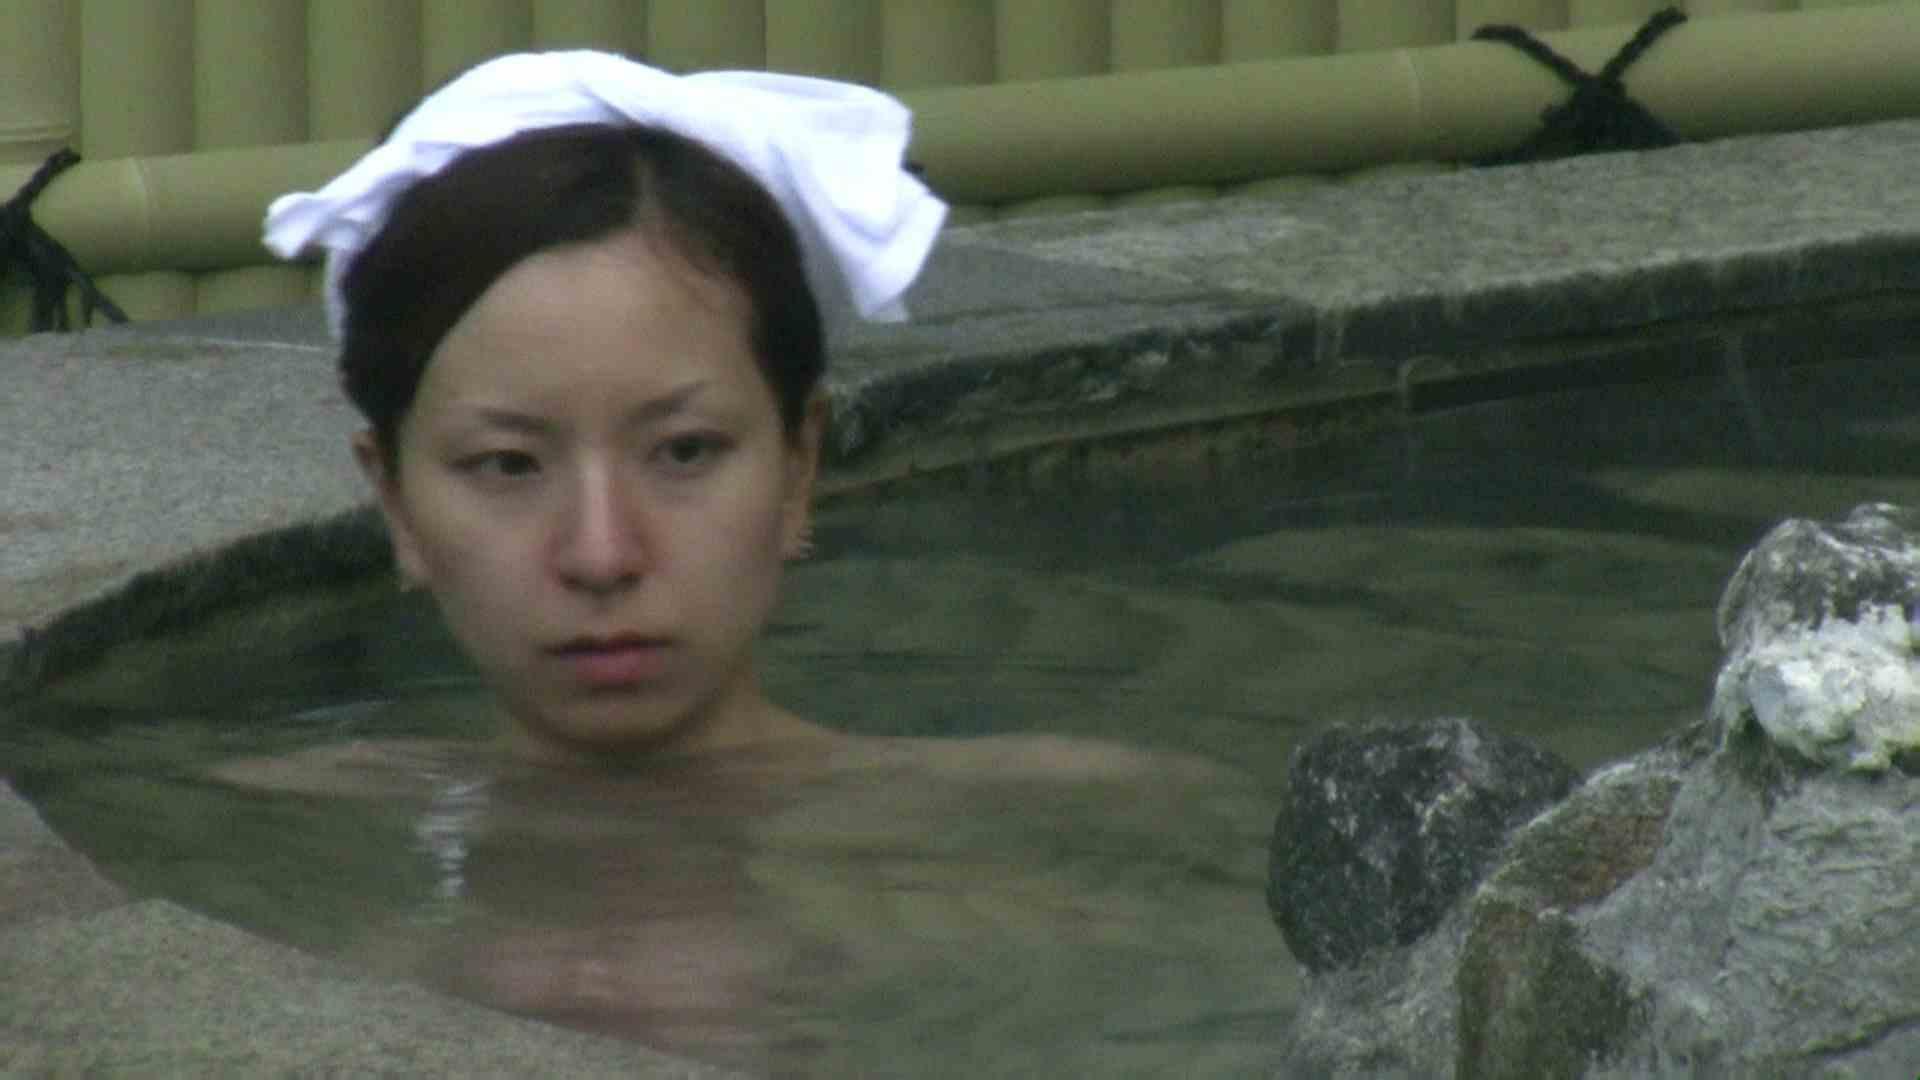 Aquaな露天風呂Vol.39【VIP】 綺麗なOLたち オマンコ動画キャプチャ 111枚 38